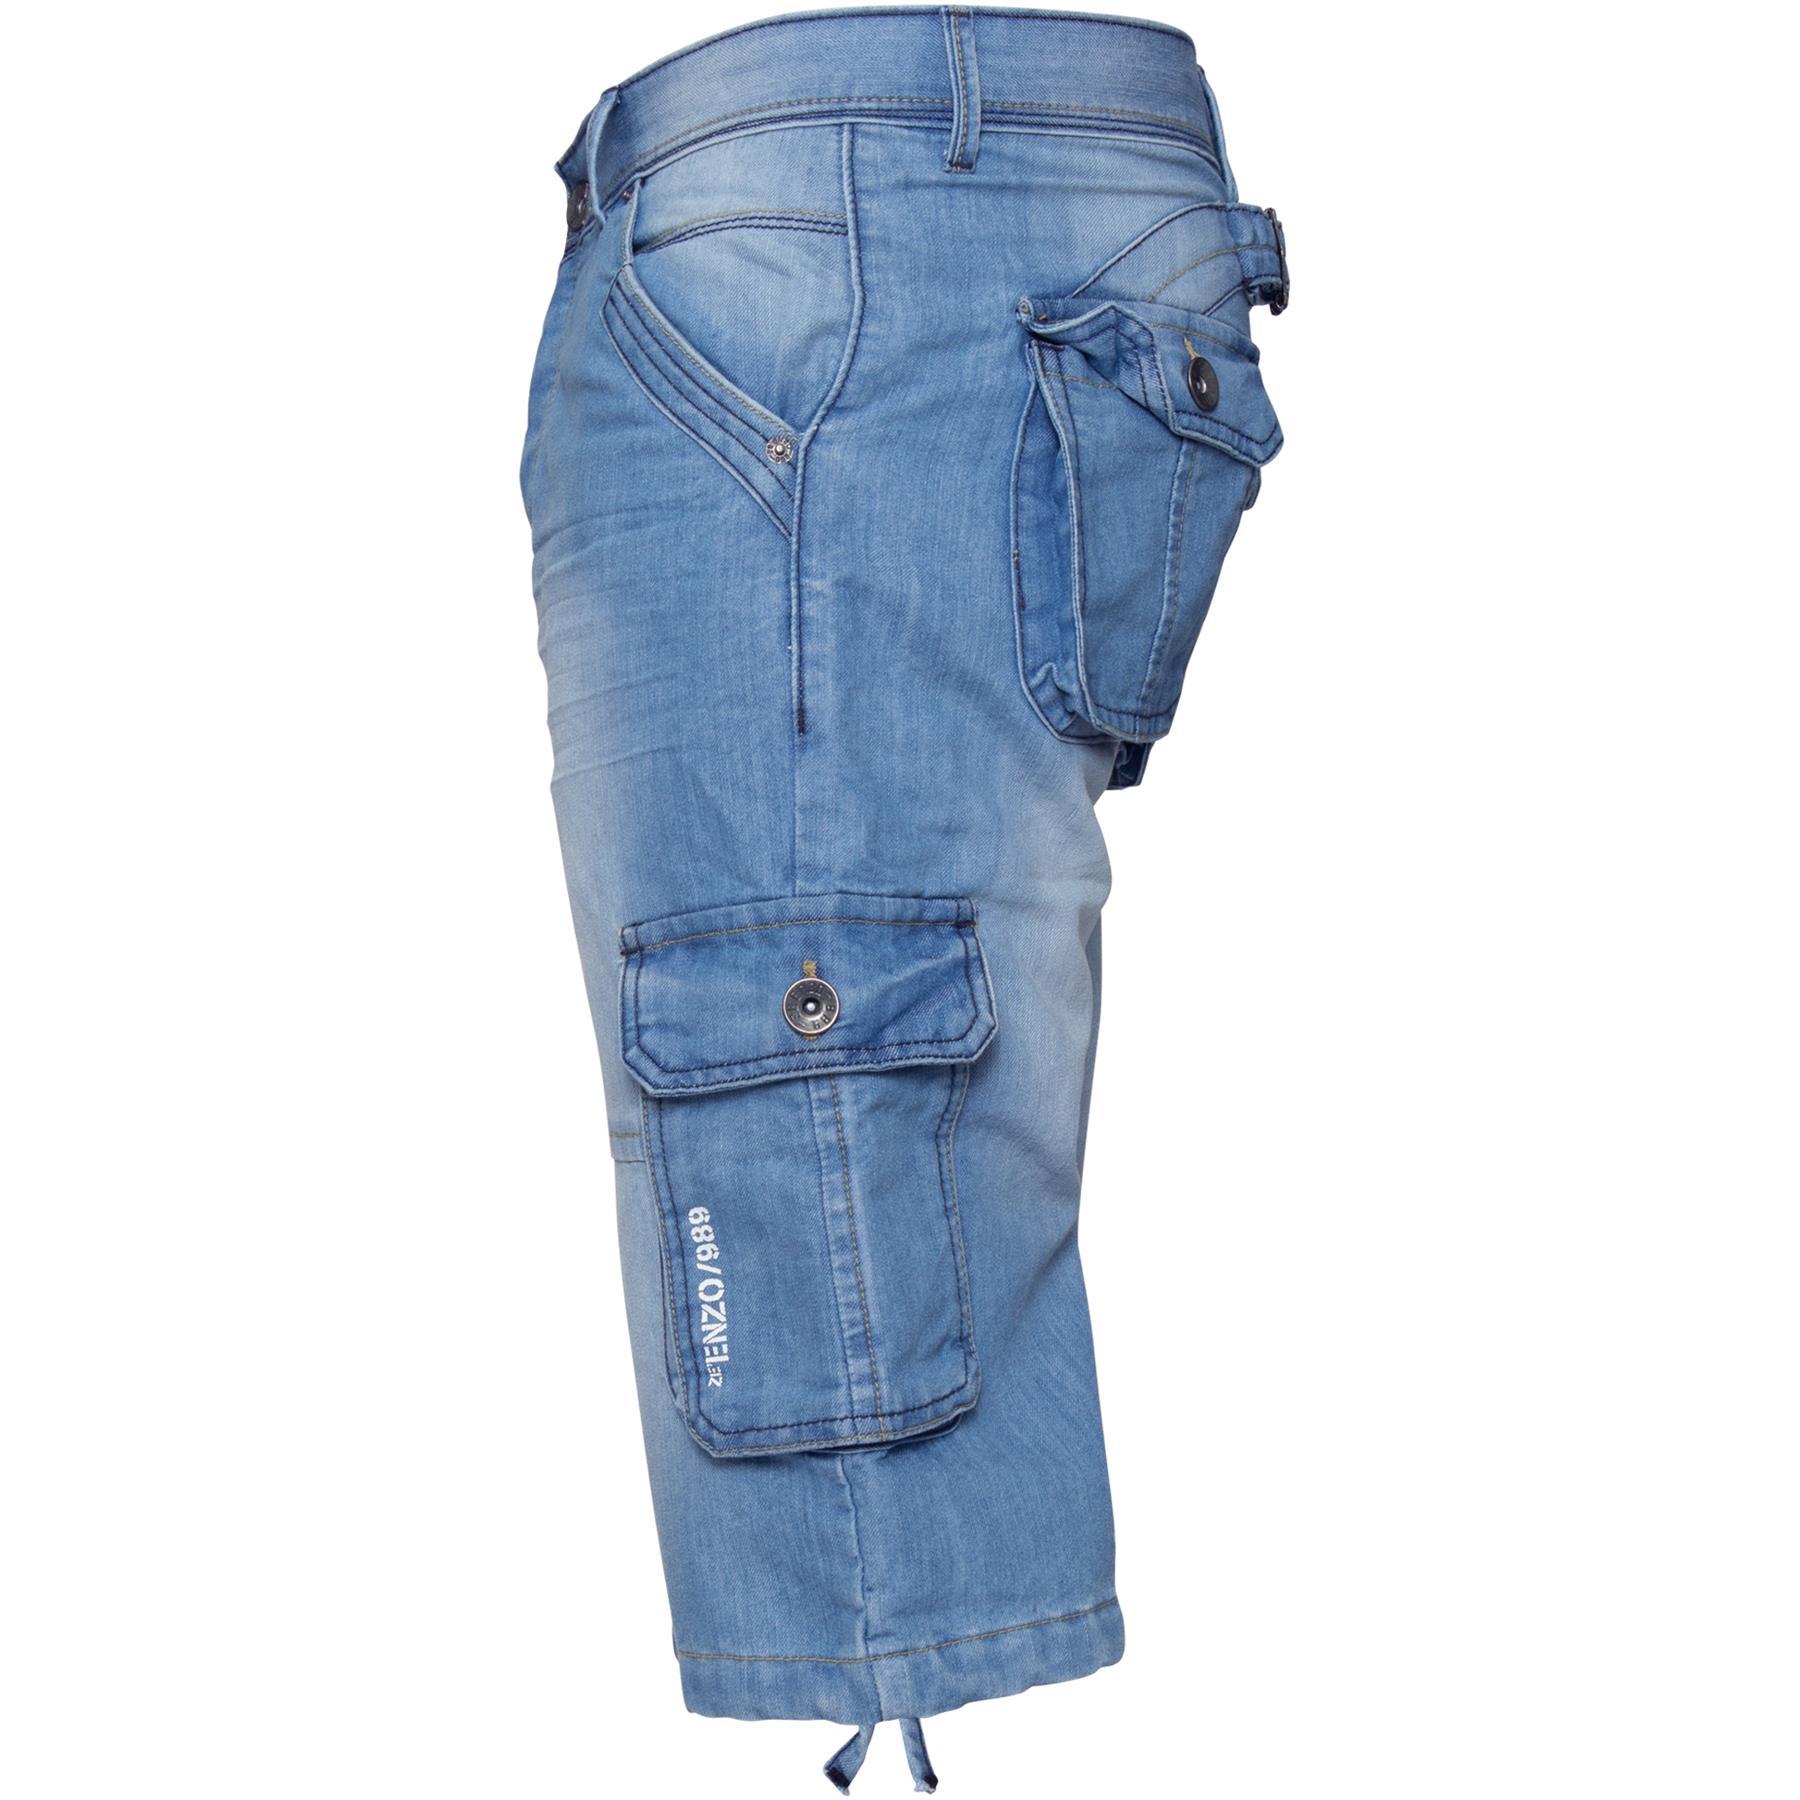 ENZO-Jeans-para-hombre-de-carga-combate-informal-de-verano-Shorts-Pantalones-Cortos-de-Jeans-Todas miniatura 10